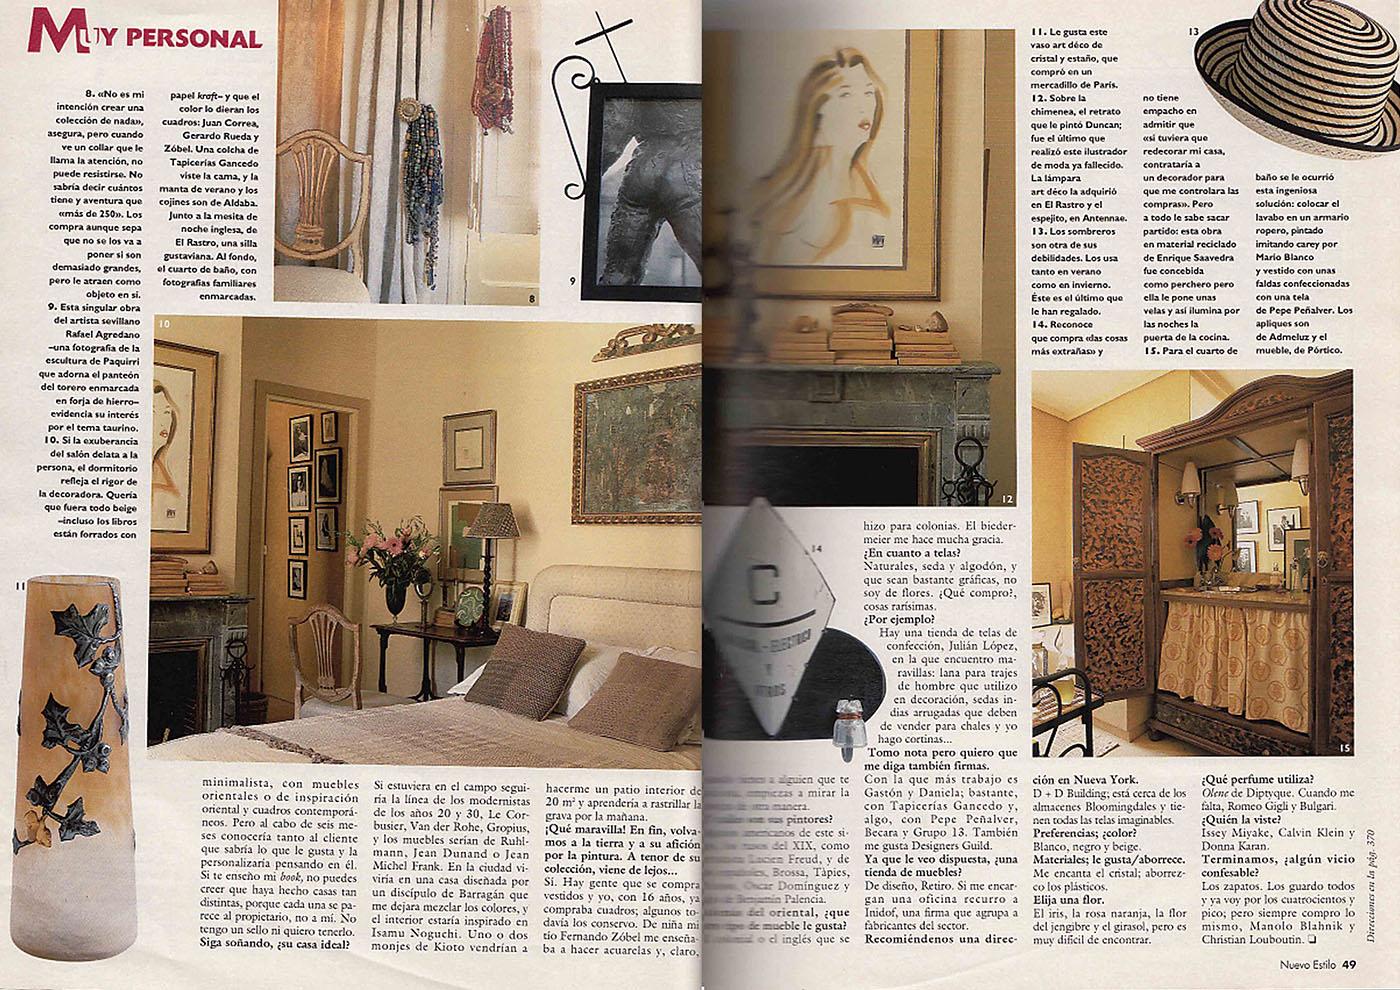 nuevo_estilo-1996-melian_randolph-2